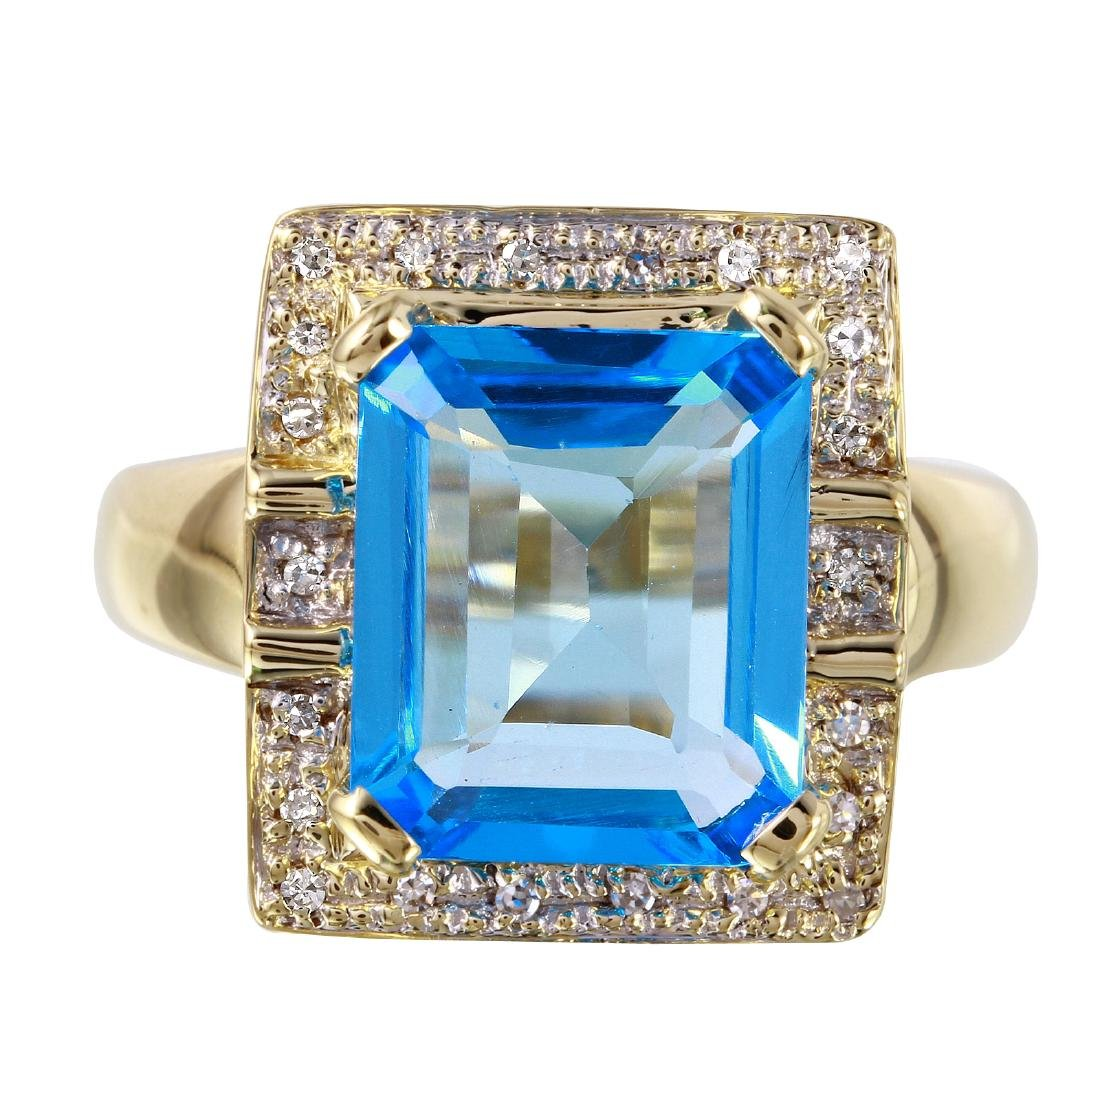 14KT Yellow Gold Topaz & Diamond Ring - 3